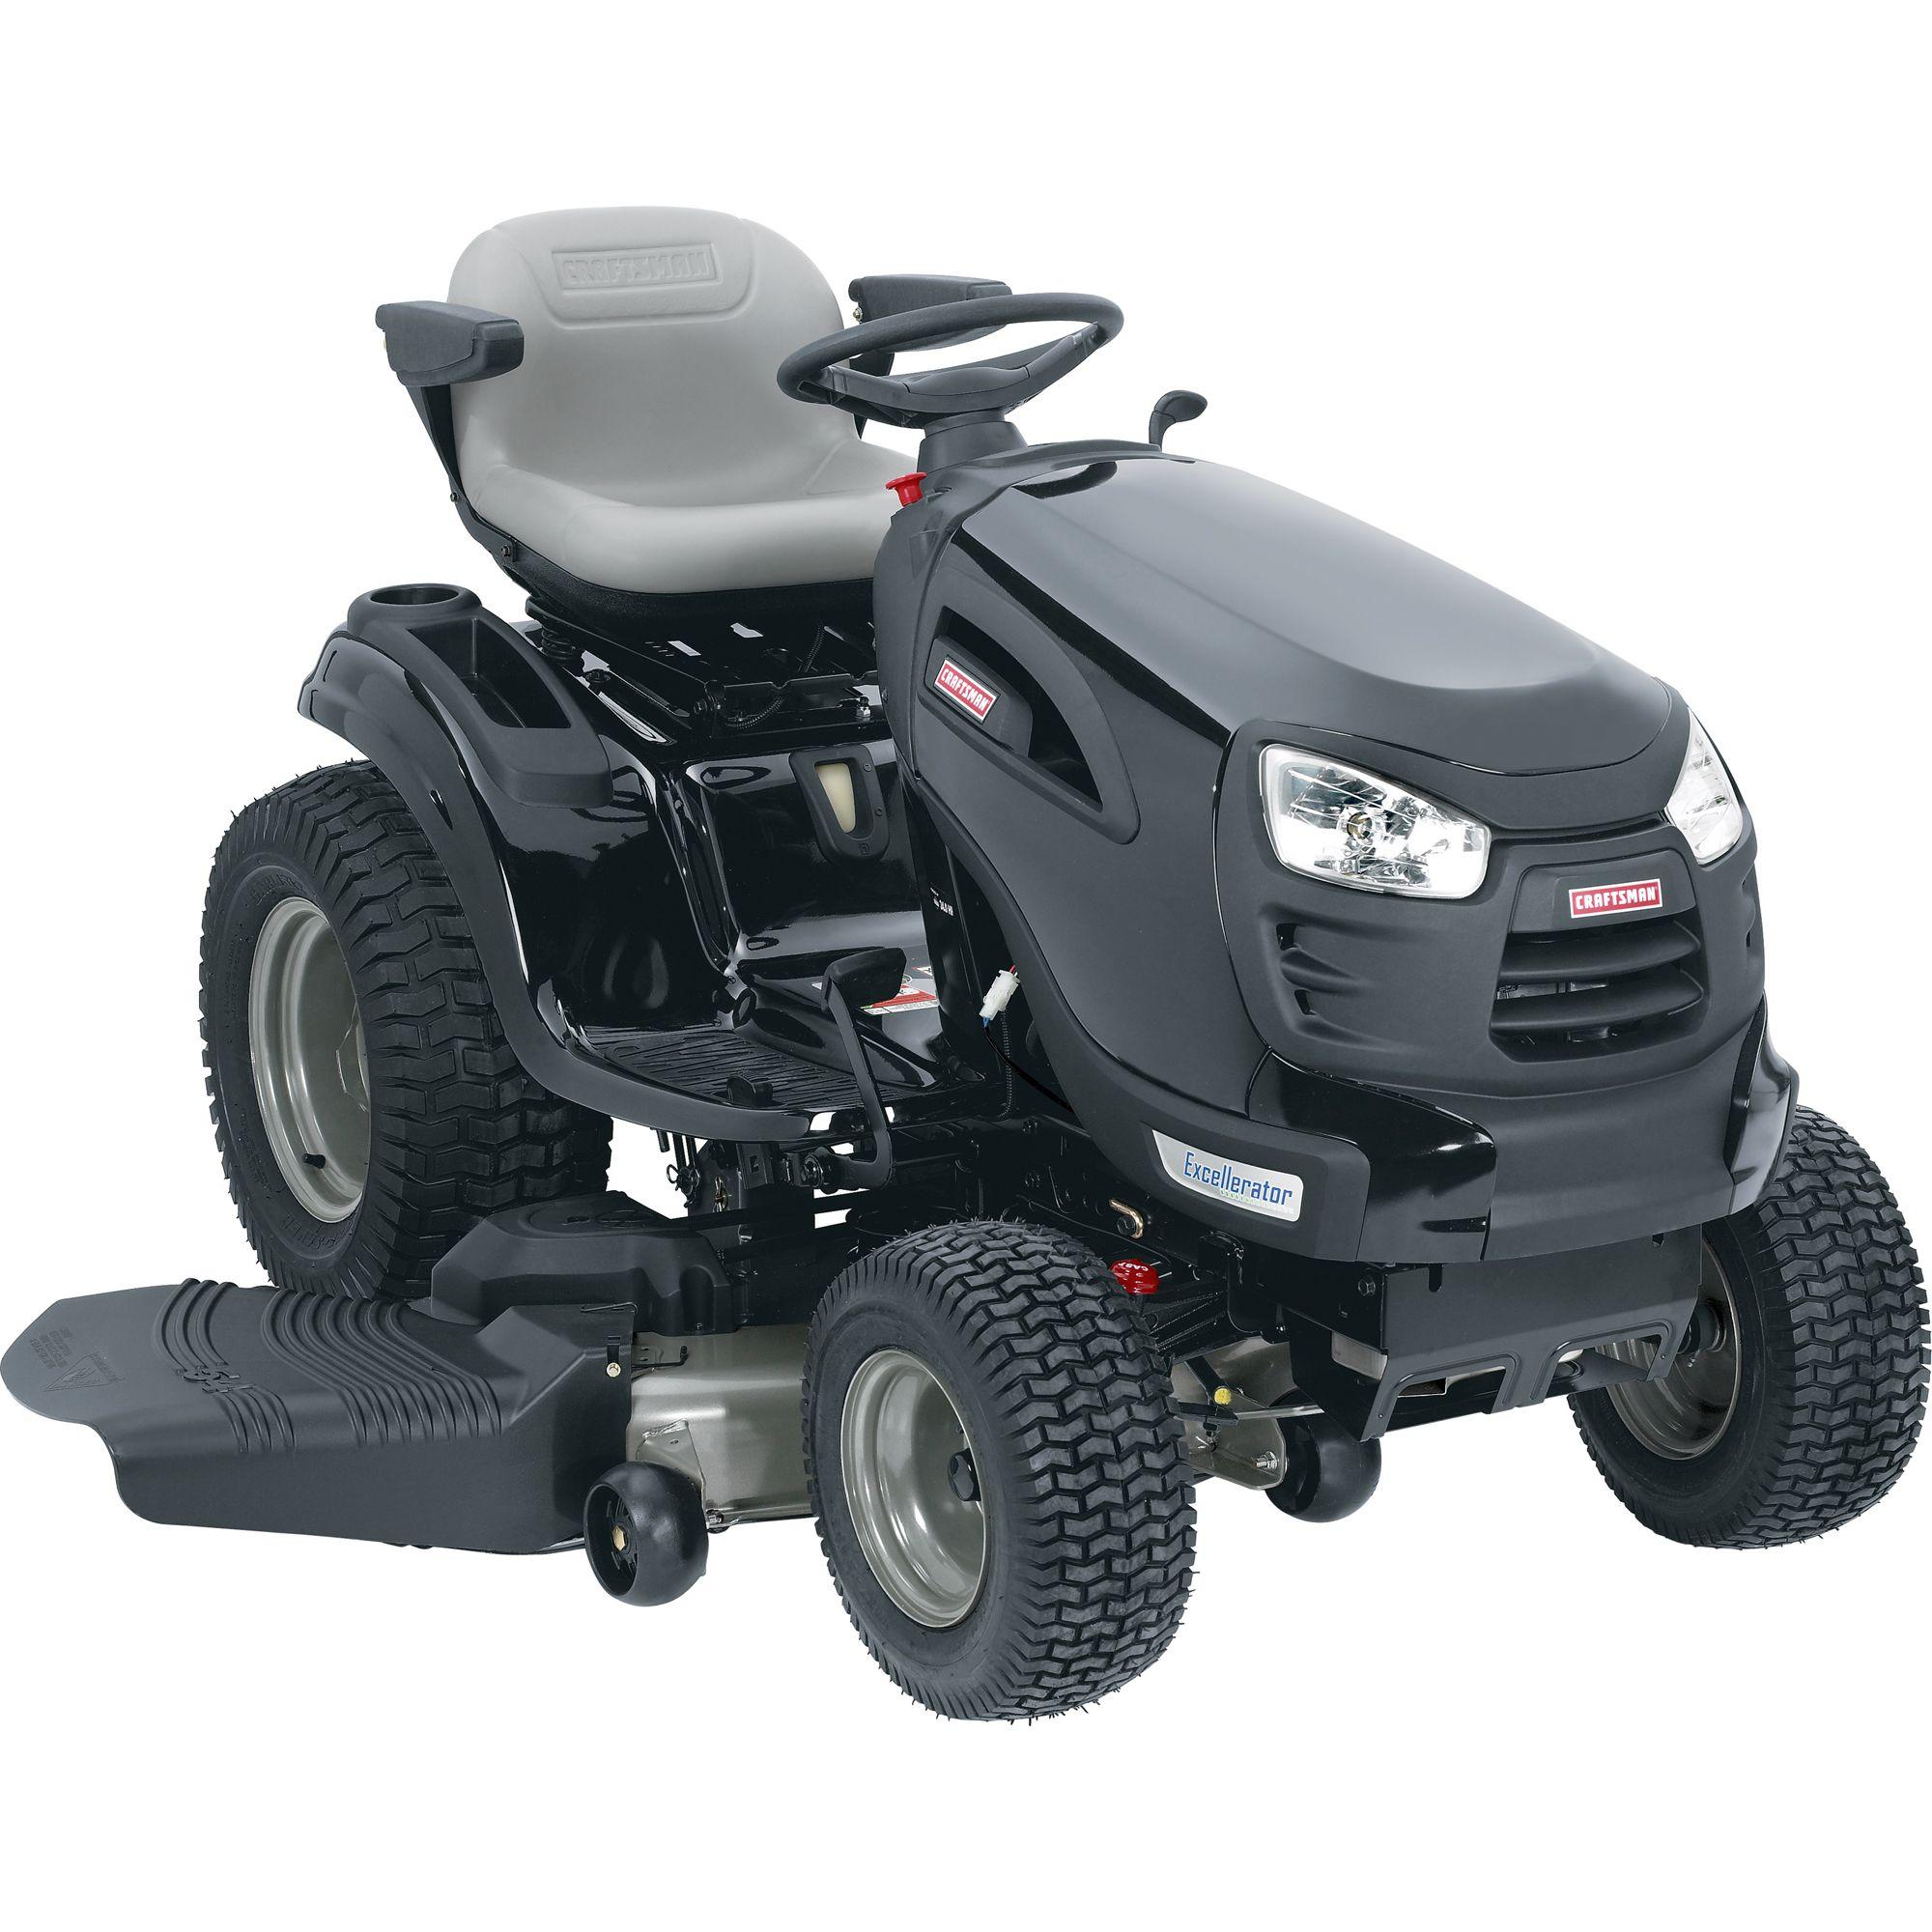 hight resolution of craftsman 28947 gt 5000 54 kohler 26 hp gas powered riding garden craftsman gt5000 wiring harness